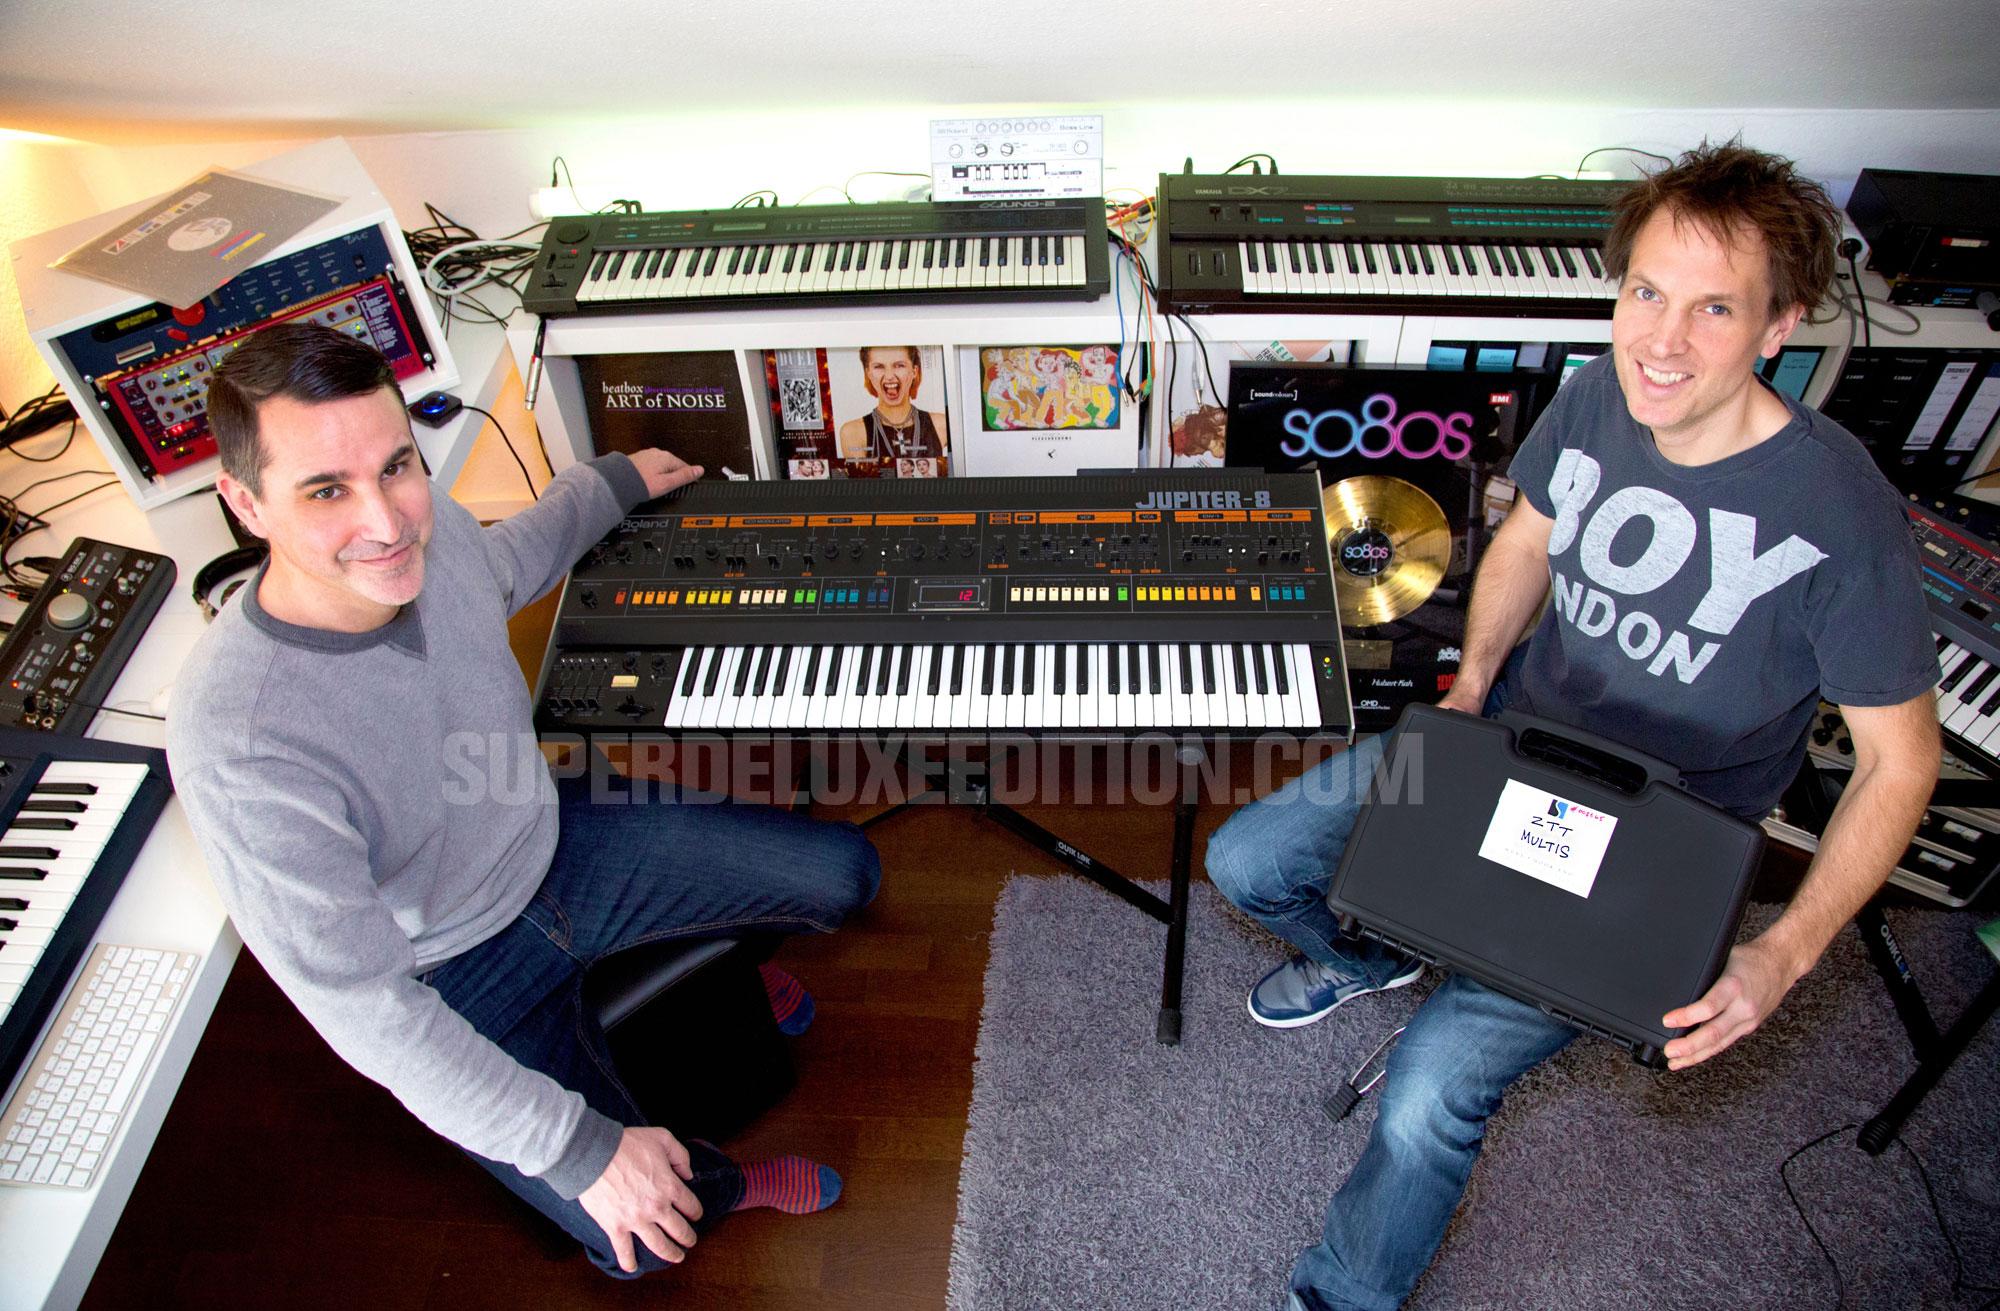 Blank & Jones working on ZTT so80s compilation